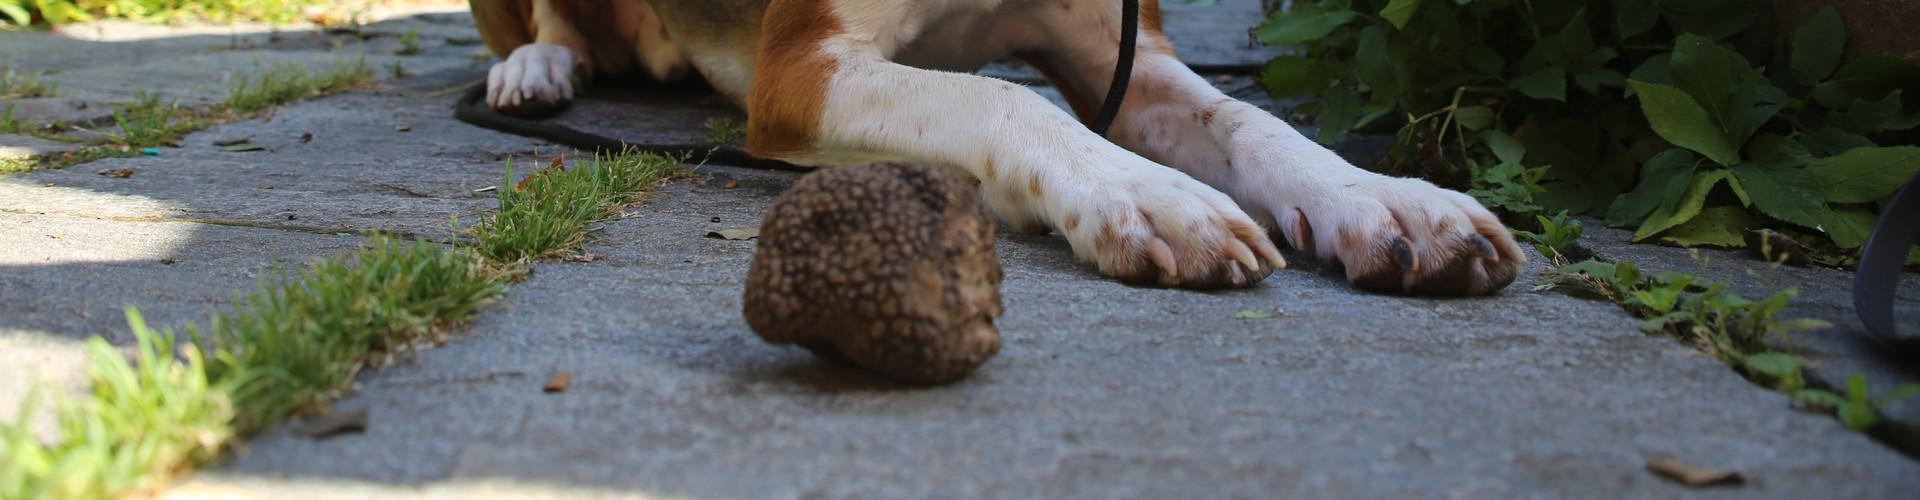 Miro, a trained truffle dog, and his harvest (Credit: Simon Egli, WSL)